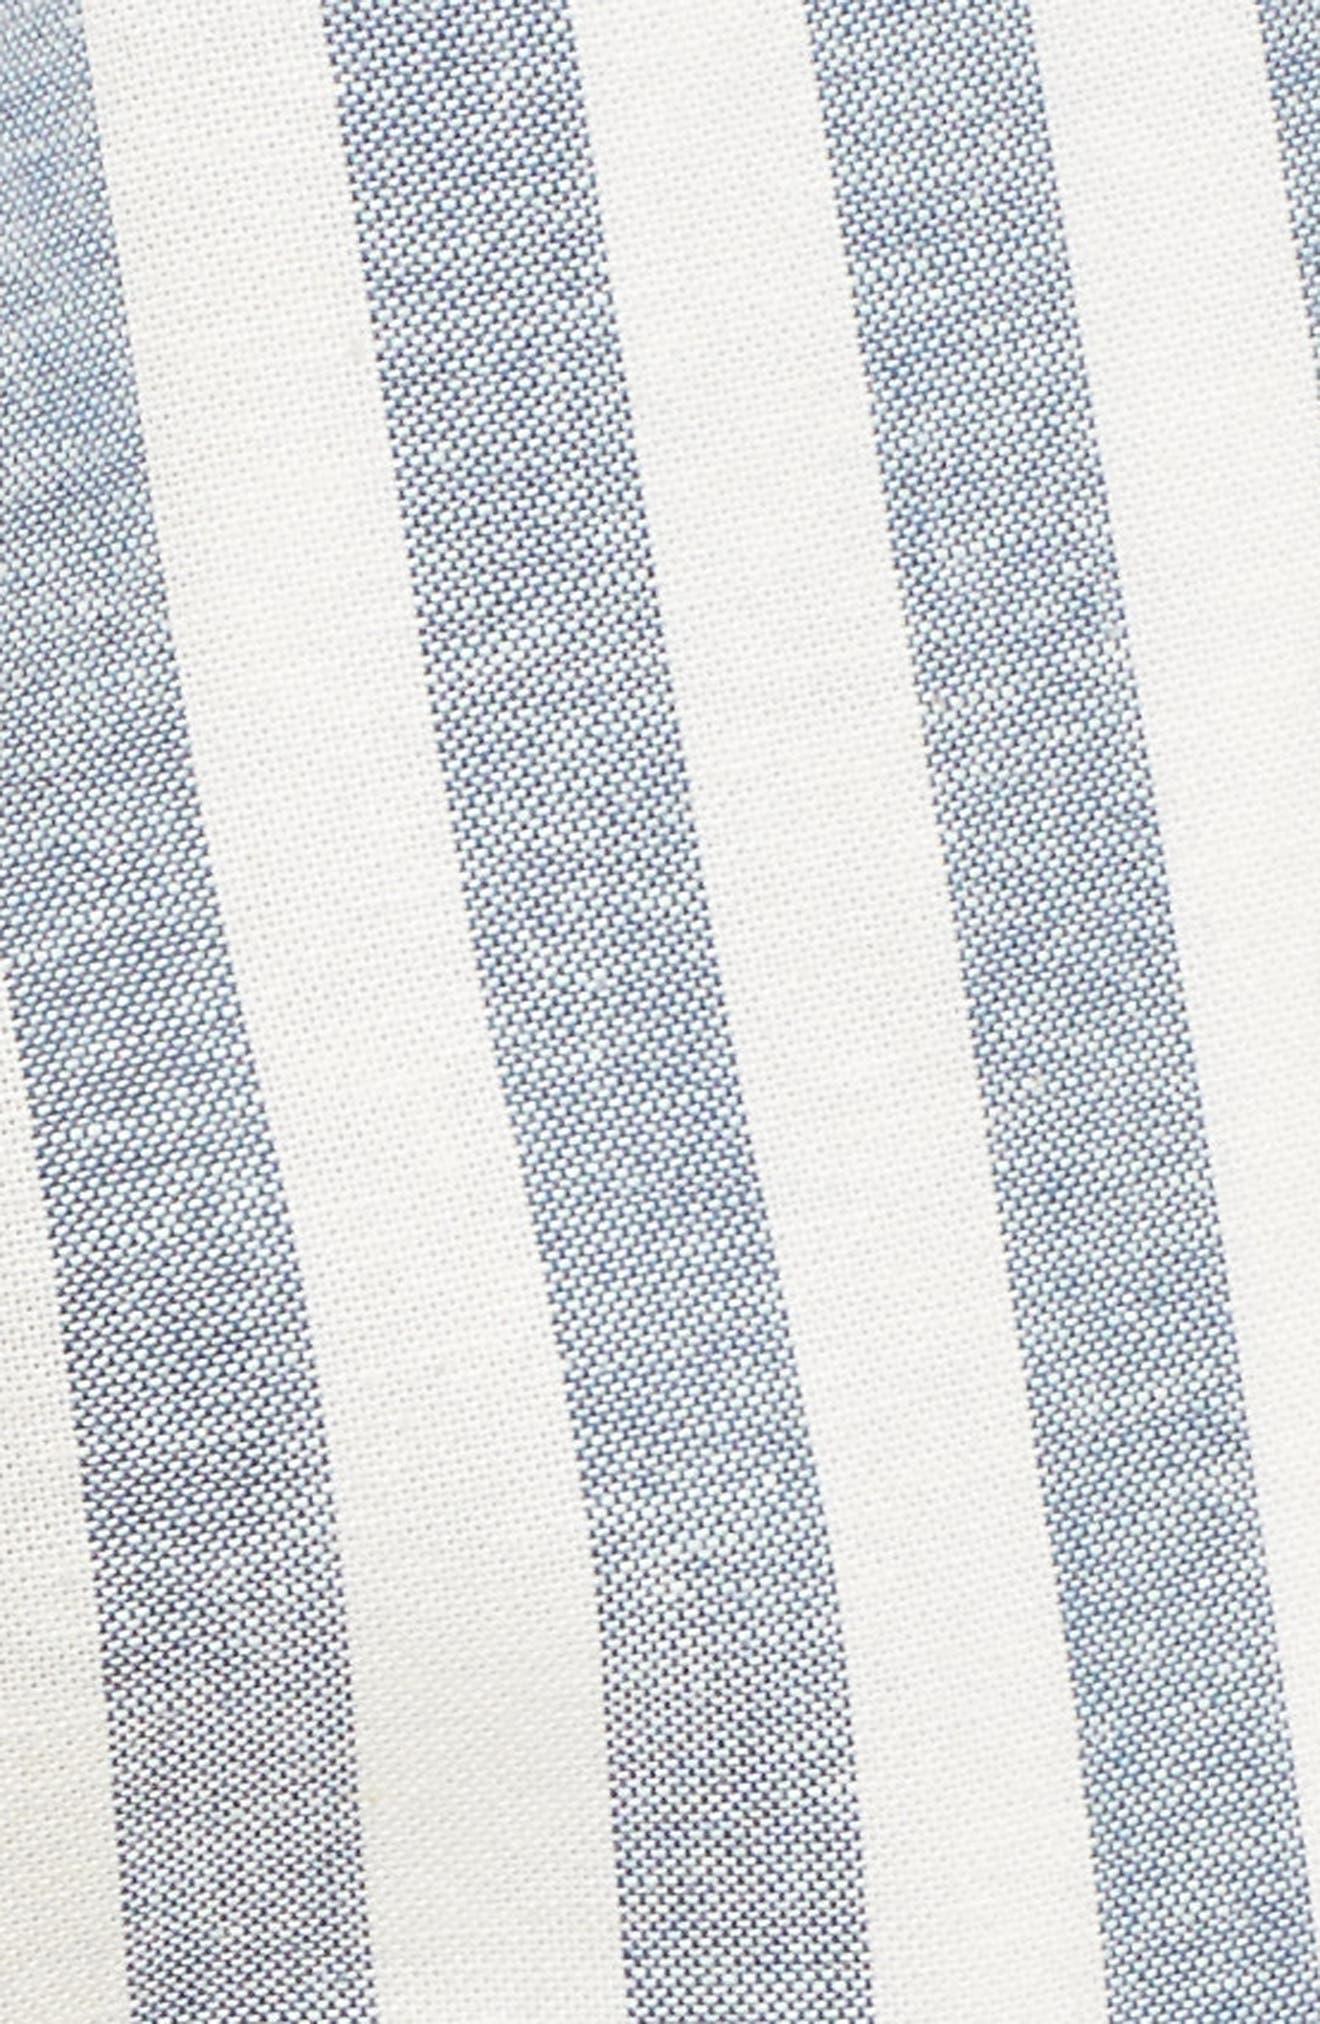 Vera Drawstring Pants,                             Alternate thumbnail 5, color,                             101